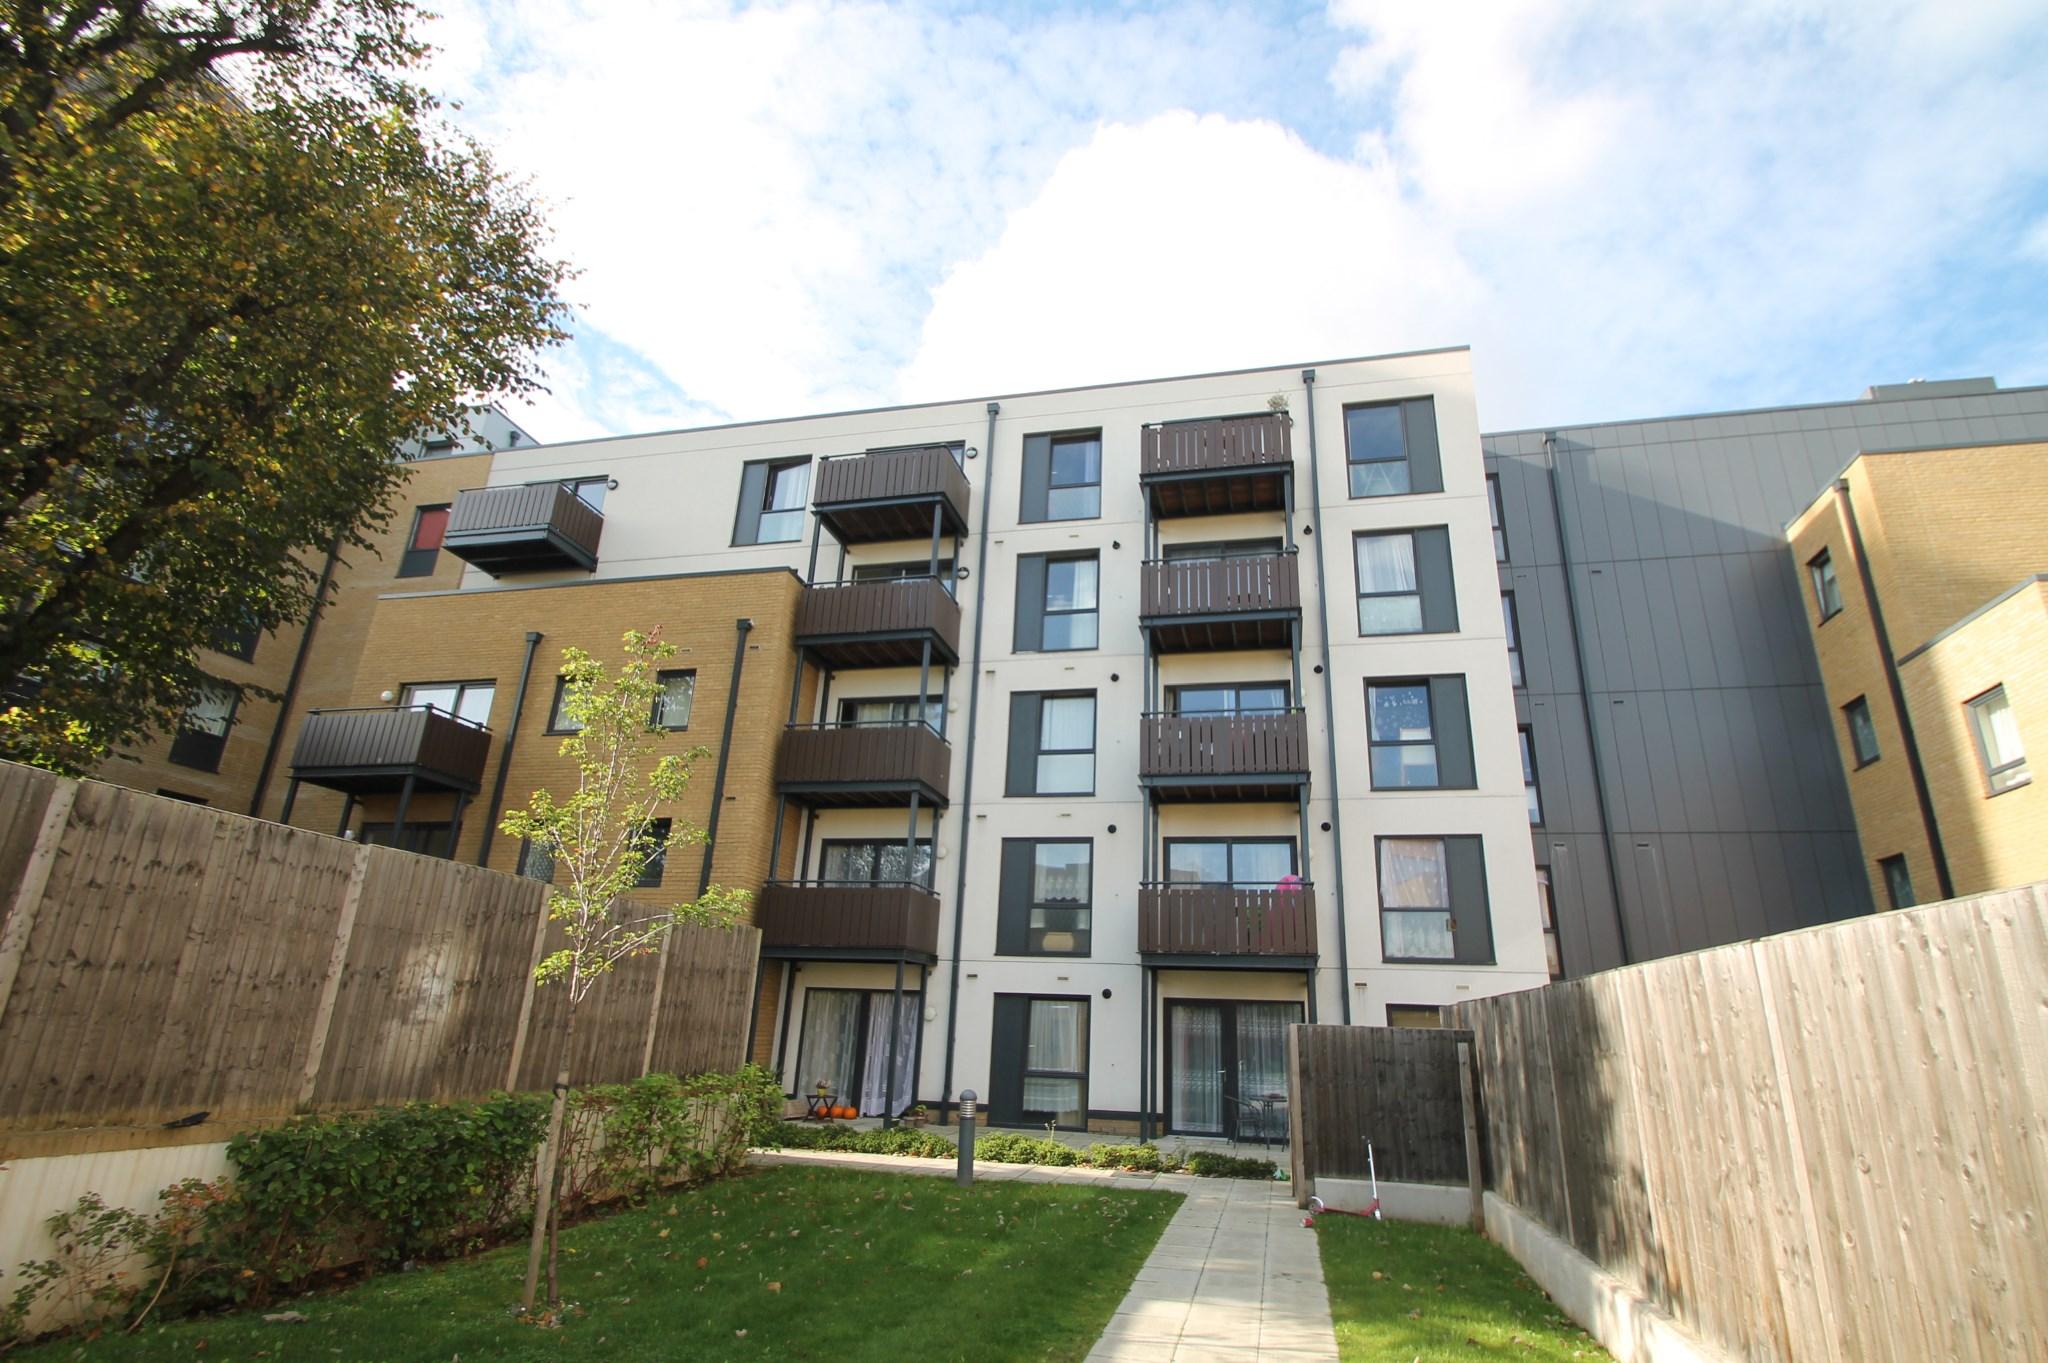 Hallam Court, 20 Whitehorse Road, Croydon, Surrey, CR0